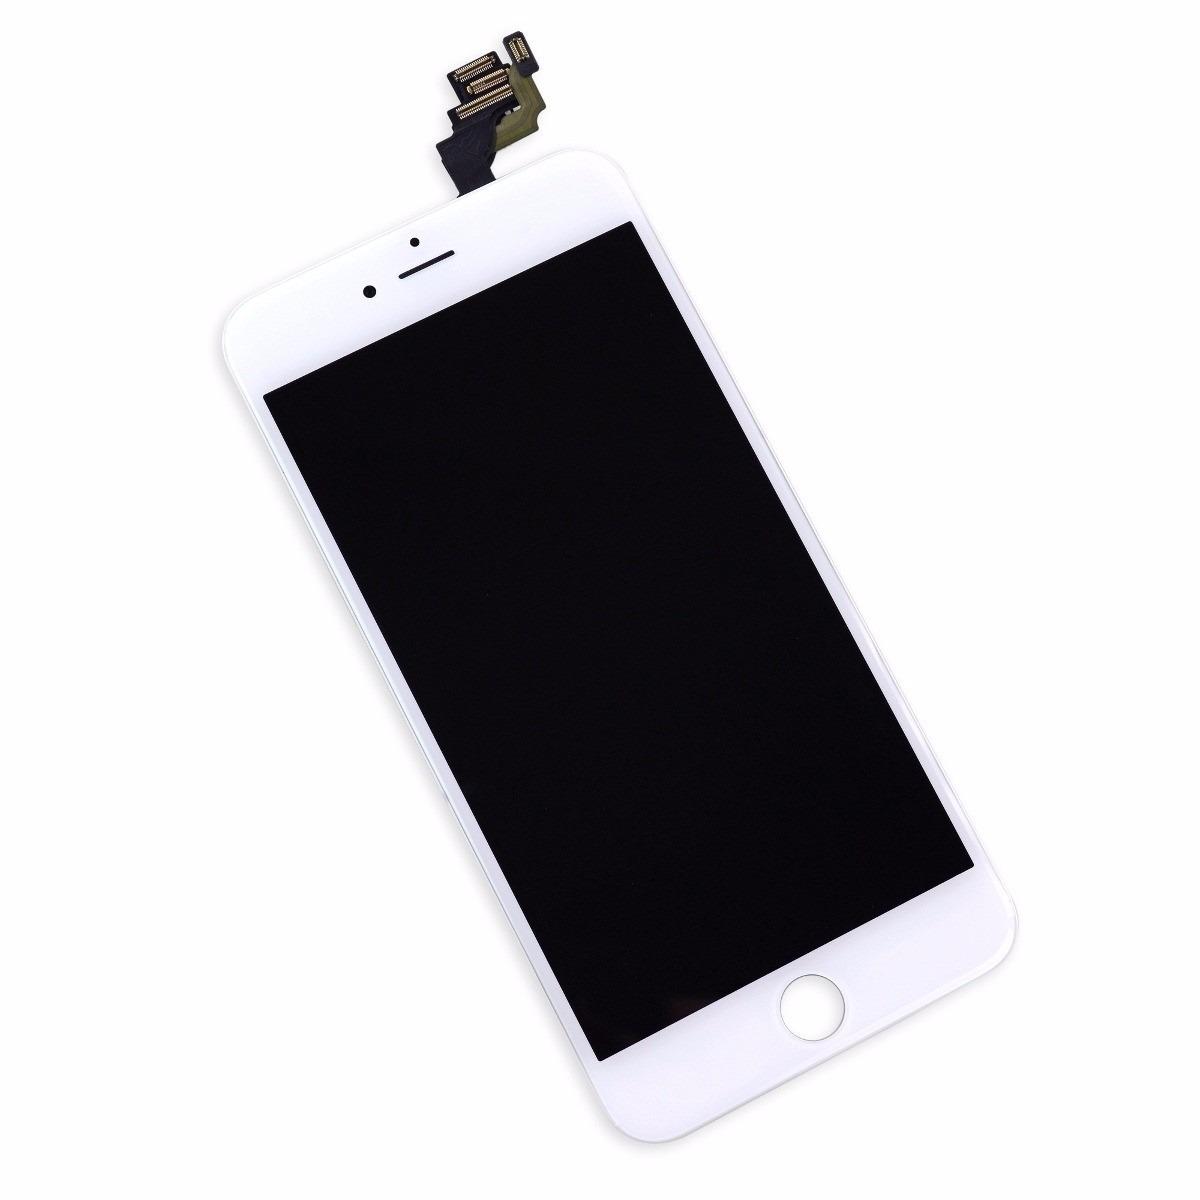 Tela Touch Lcd Display Apple iPhone 6S Plus Original